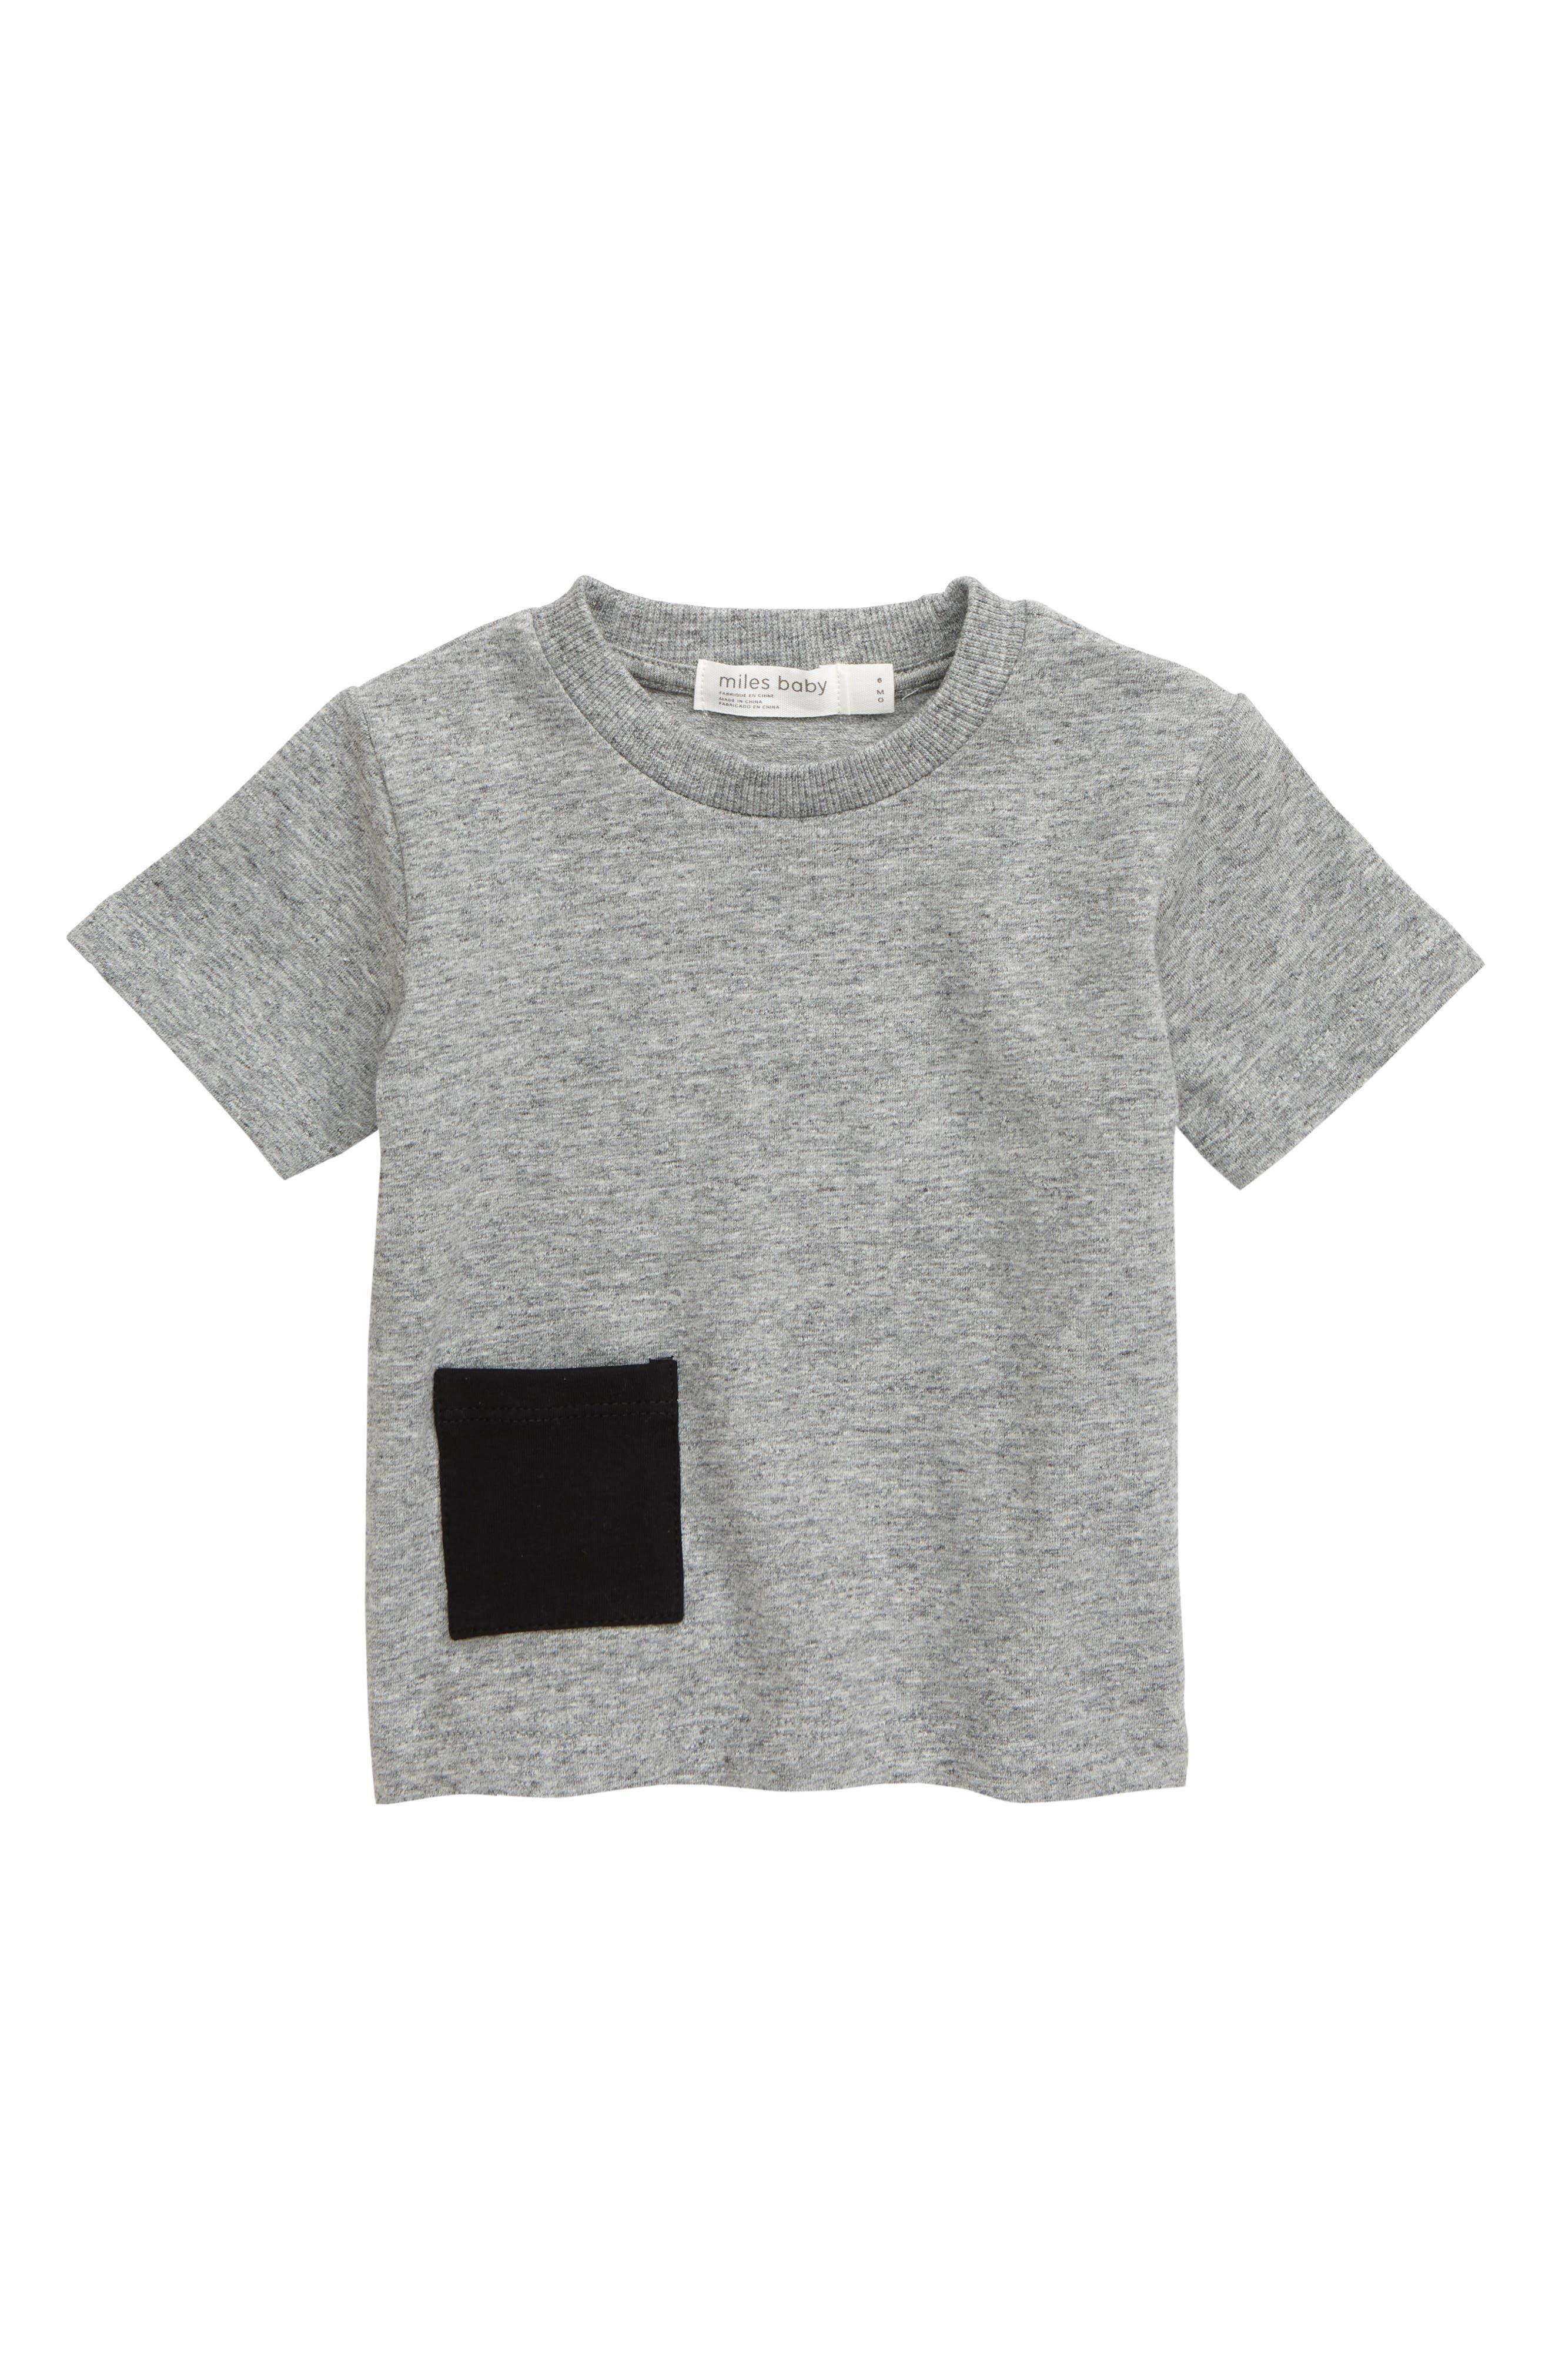 Infant Boys Miles Baby Stretch Organic Cotton TShirt Size 18M  Grey